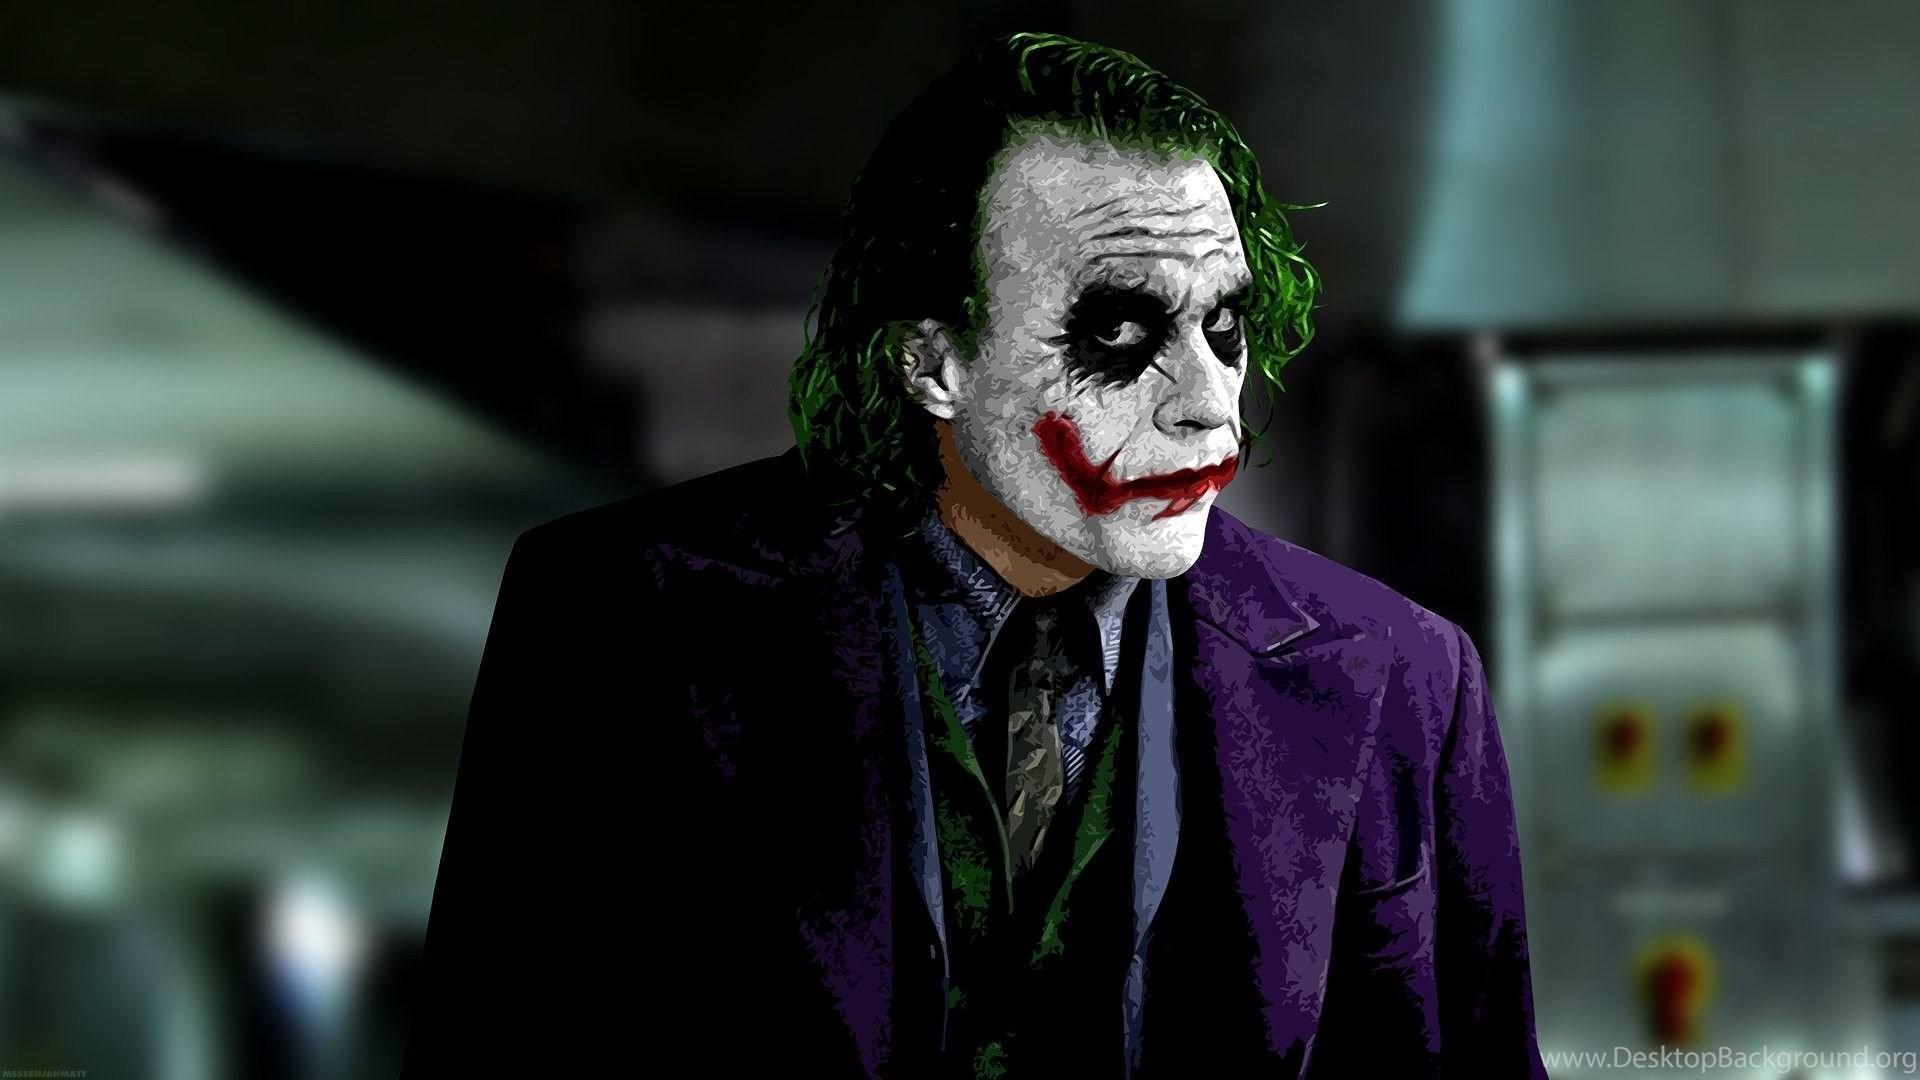 Heath Ledger Joker Wallpapers Desktop Background